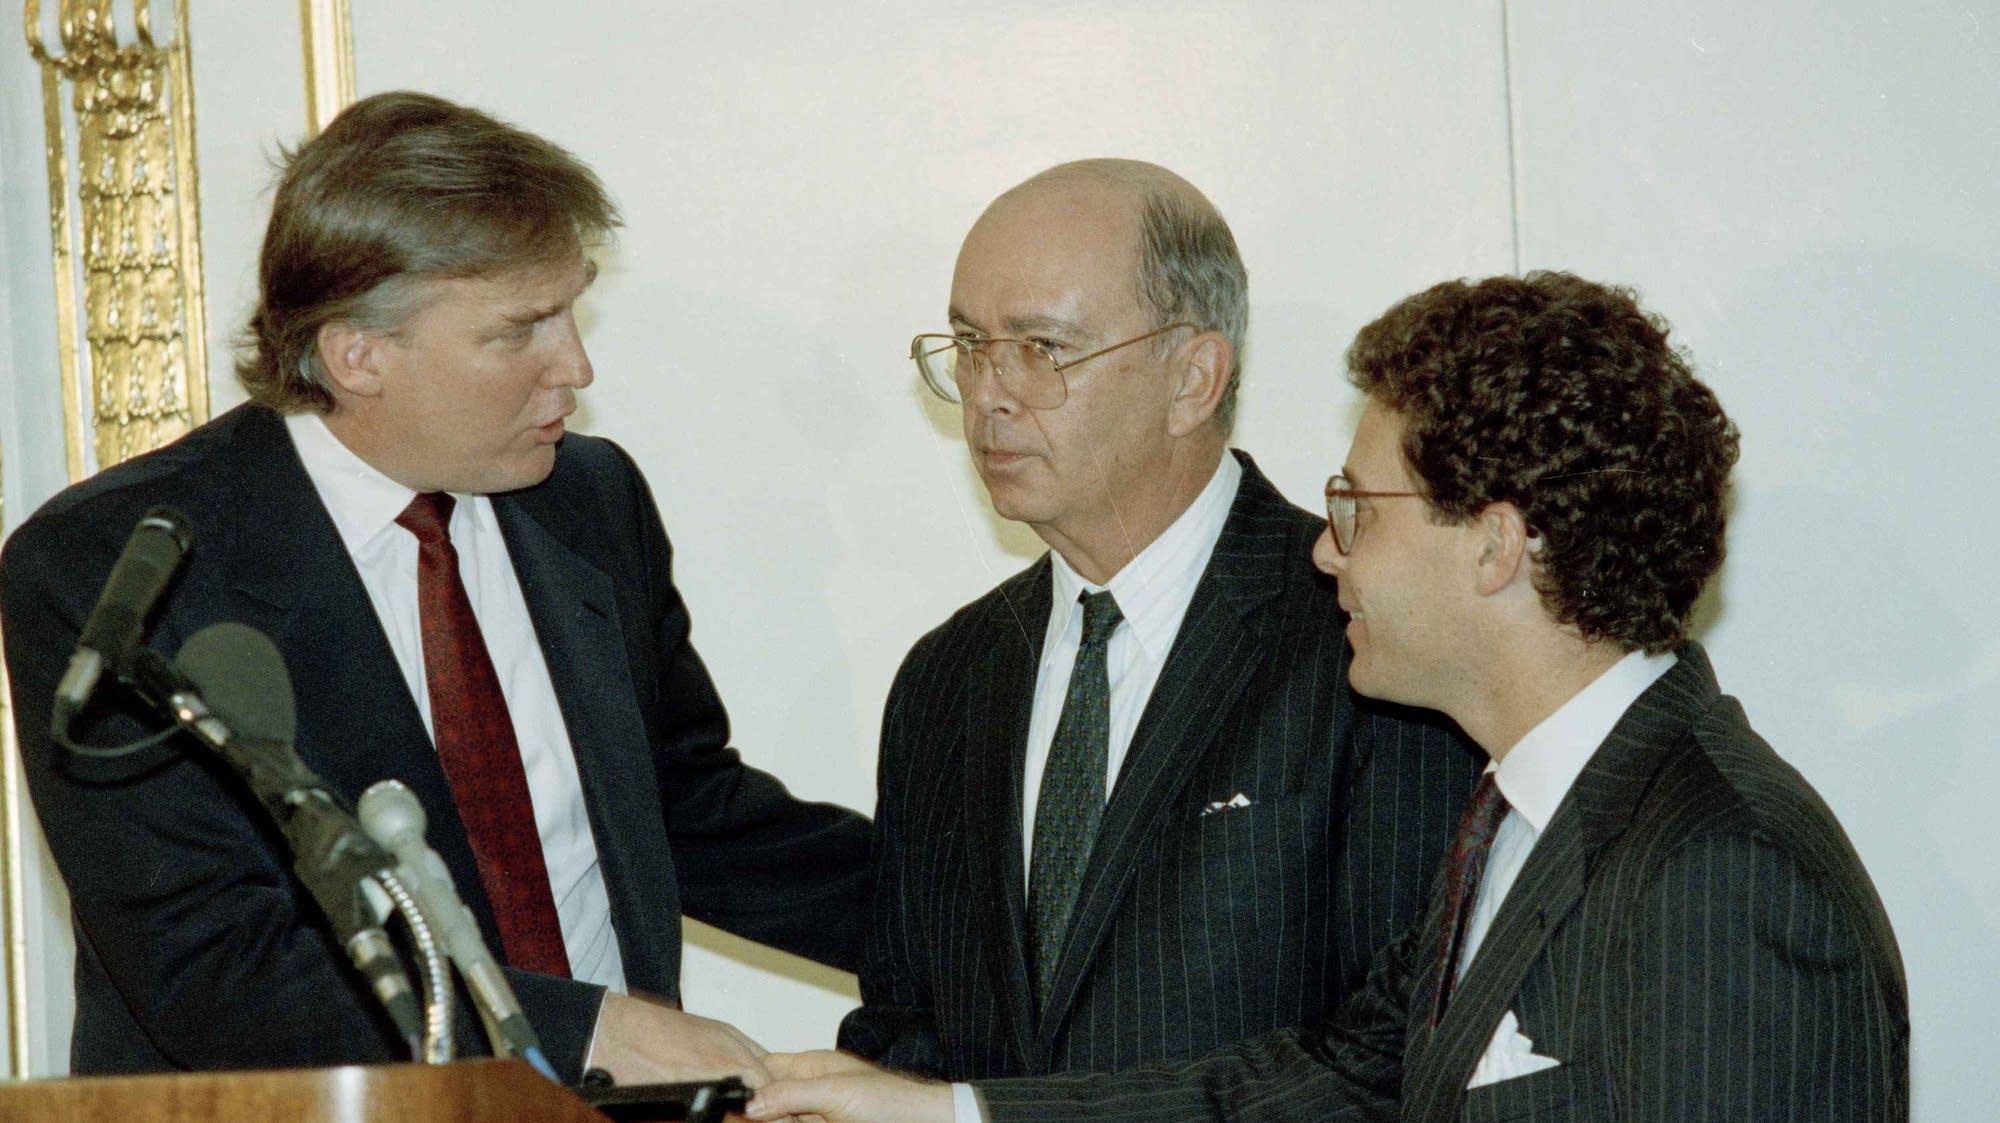 Donald Trump, Wilbur Ross